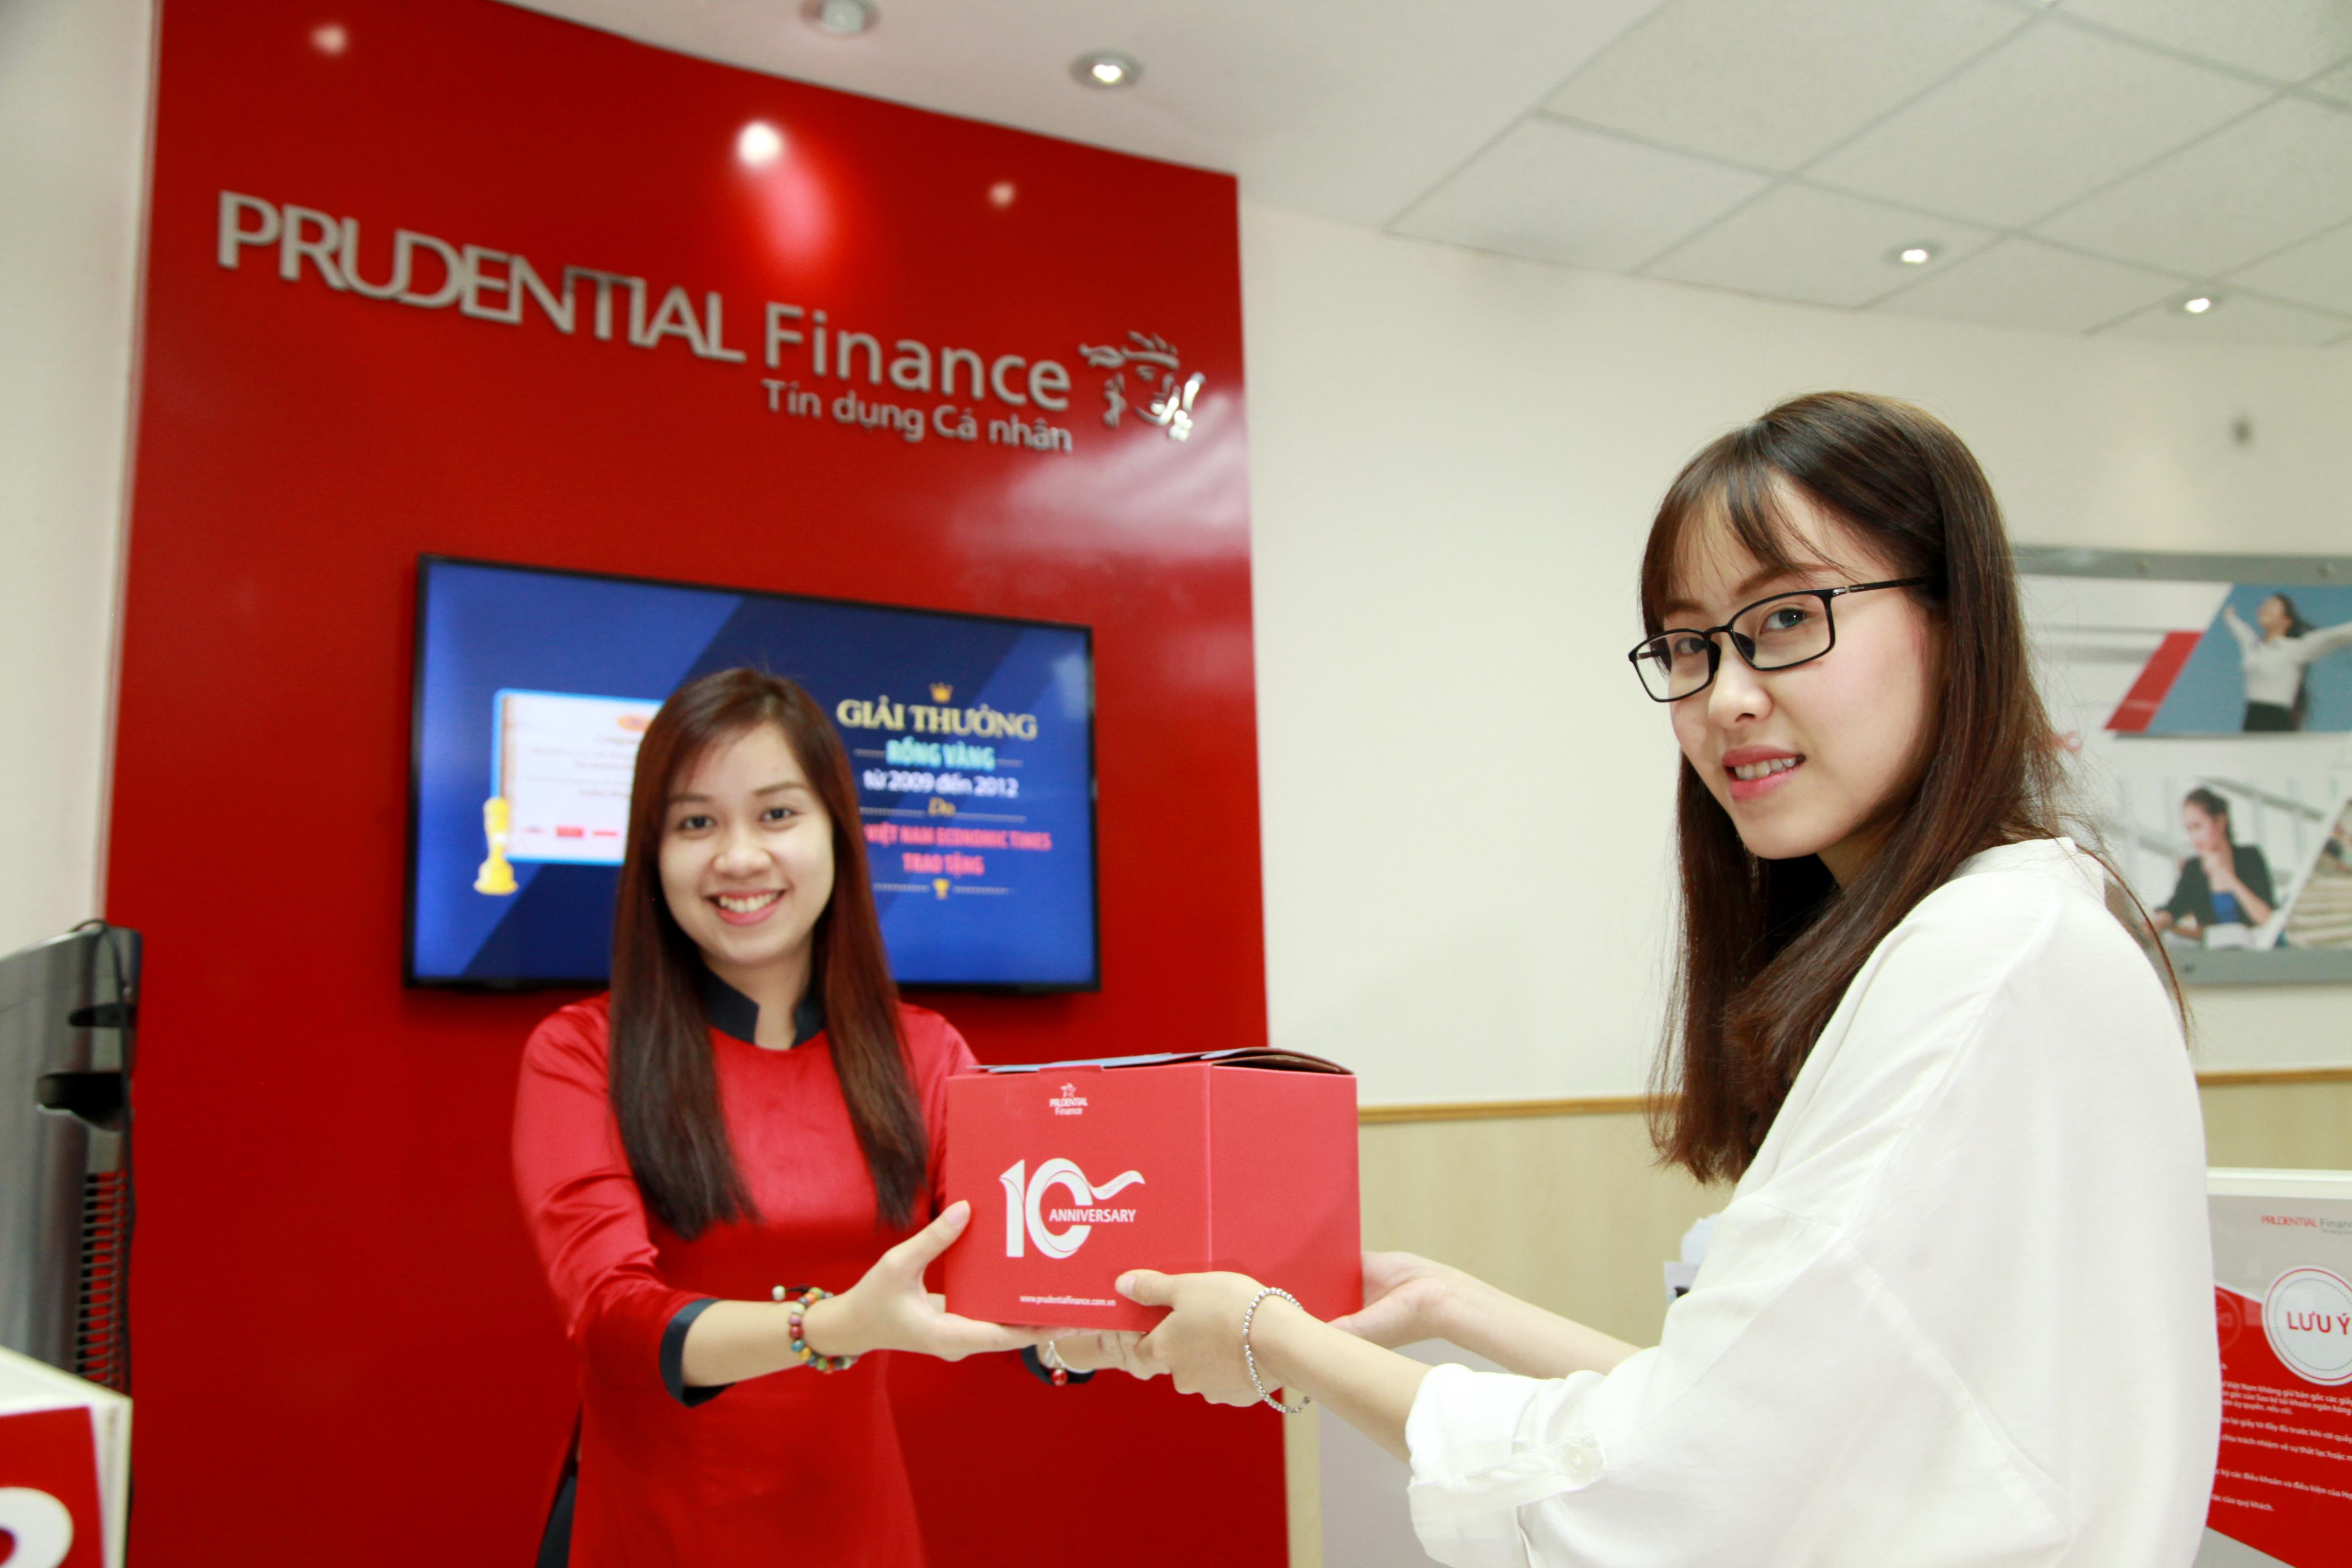 prudential finance celebrates its 10th anniversary in vietnam